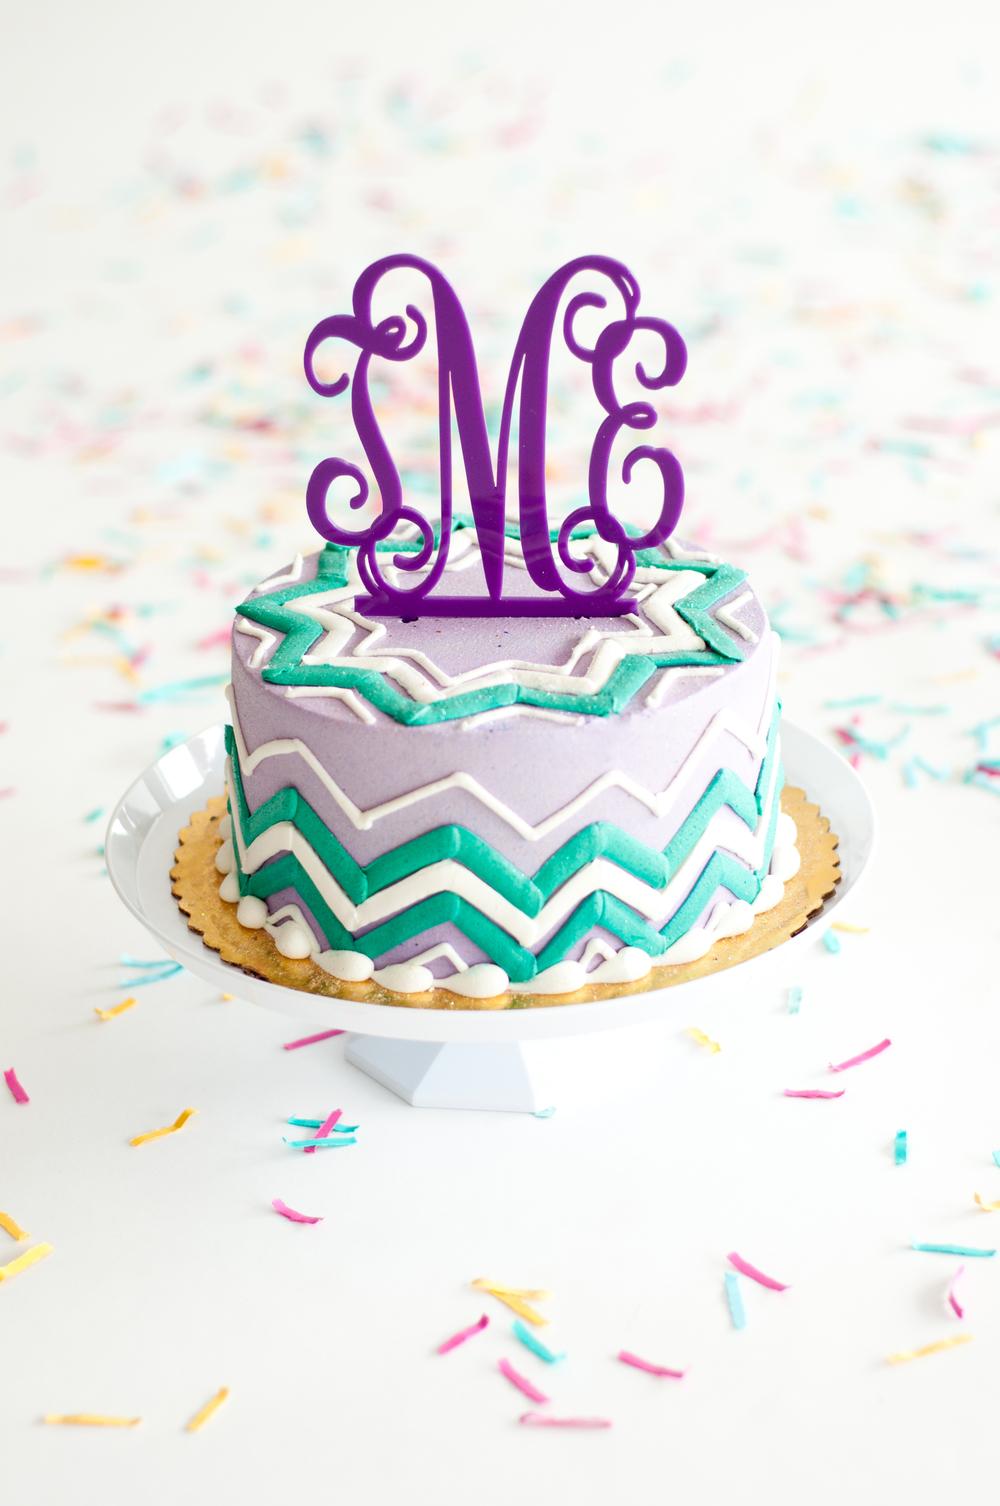 Cake Topper Purple.jpg